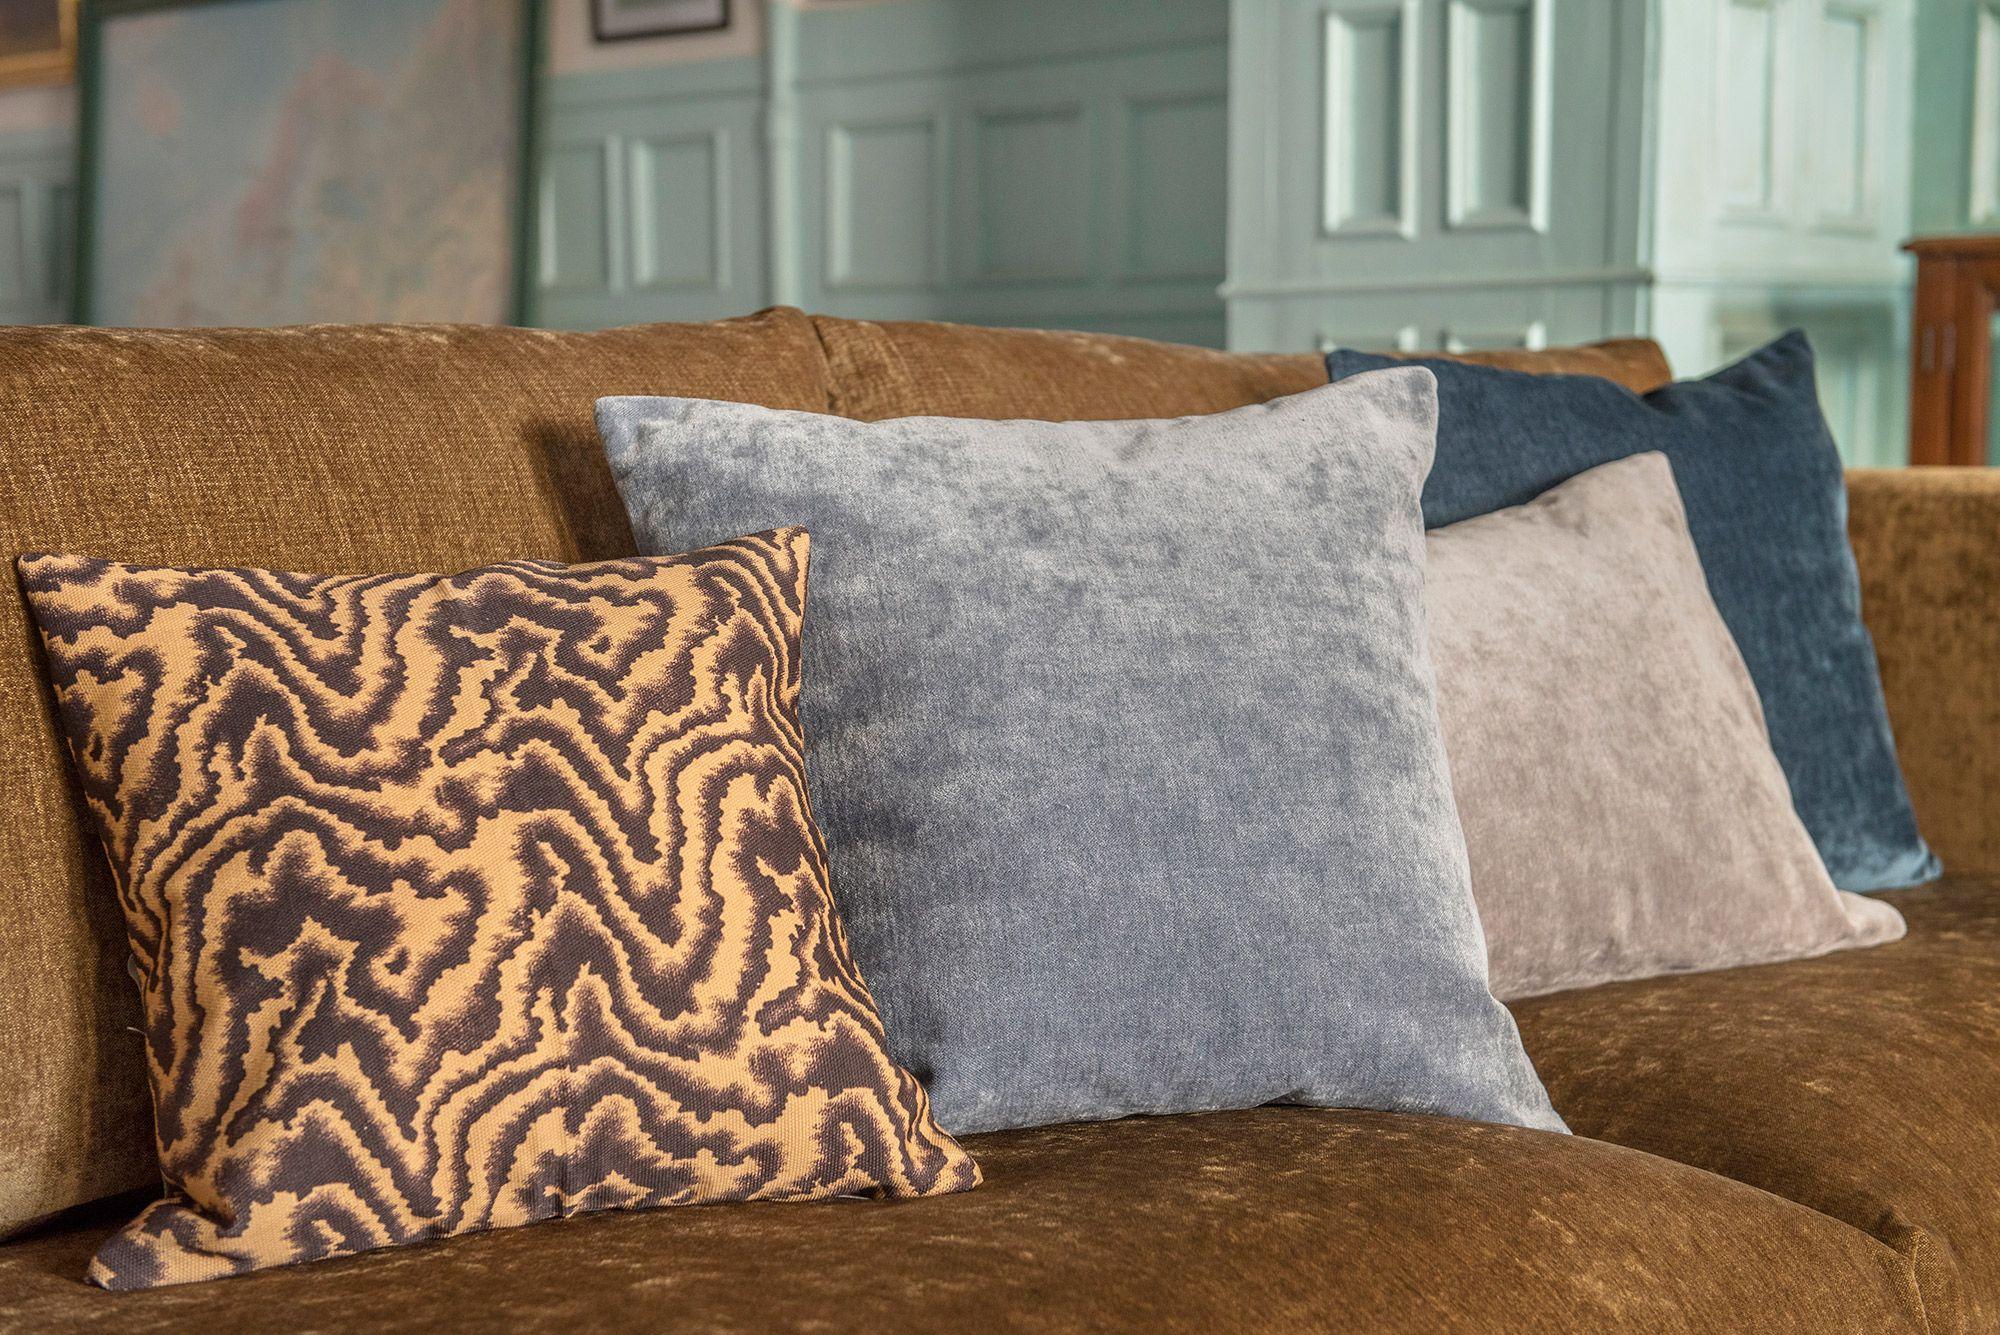 Cushion Cover 50x50cm 20x20in